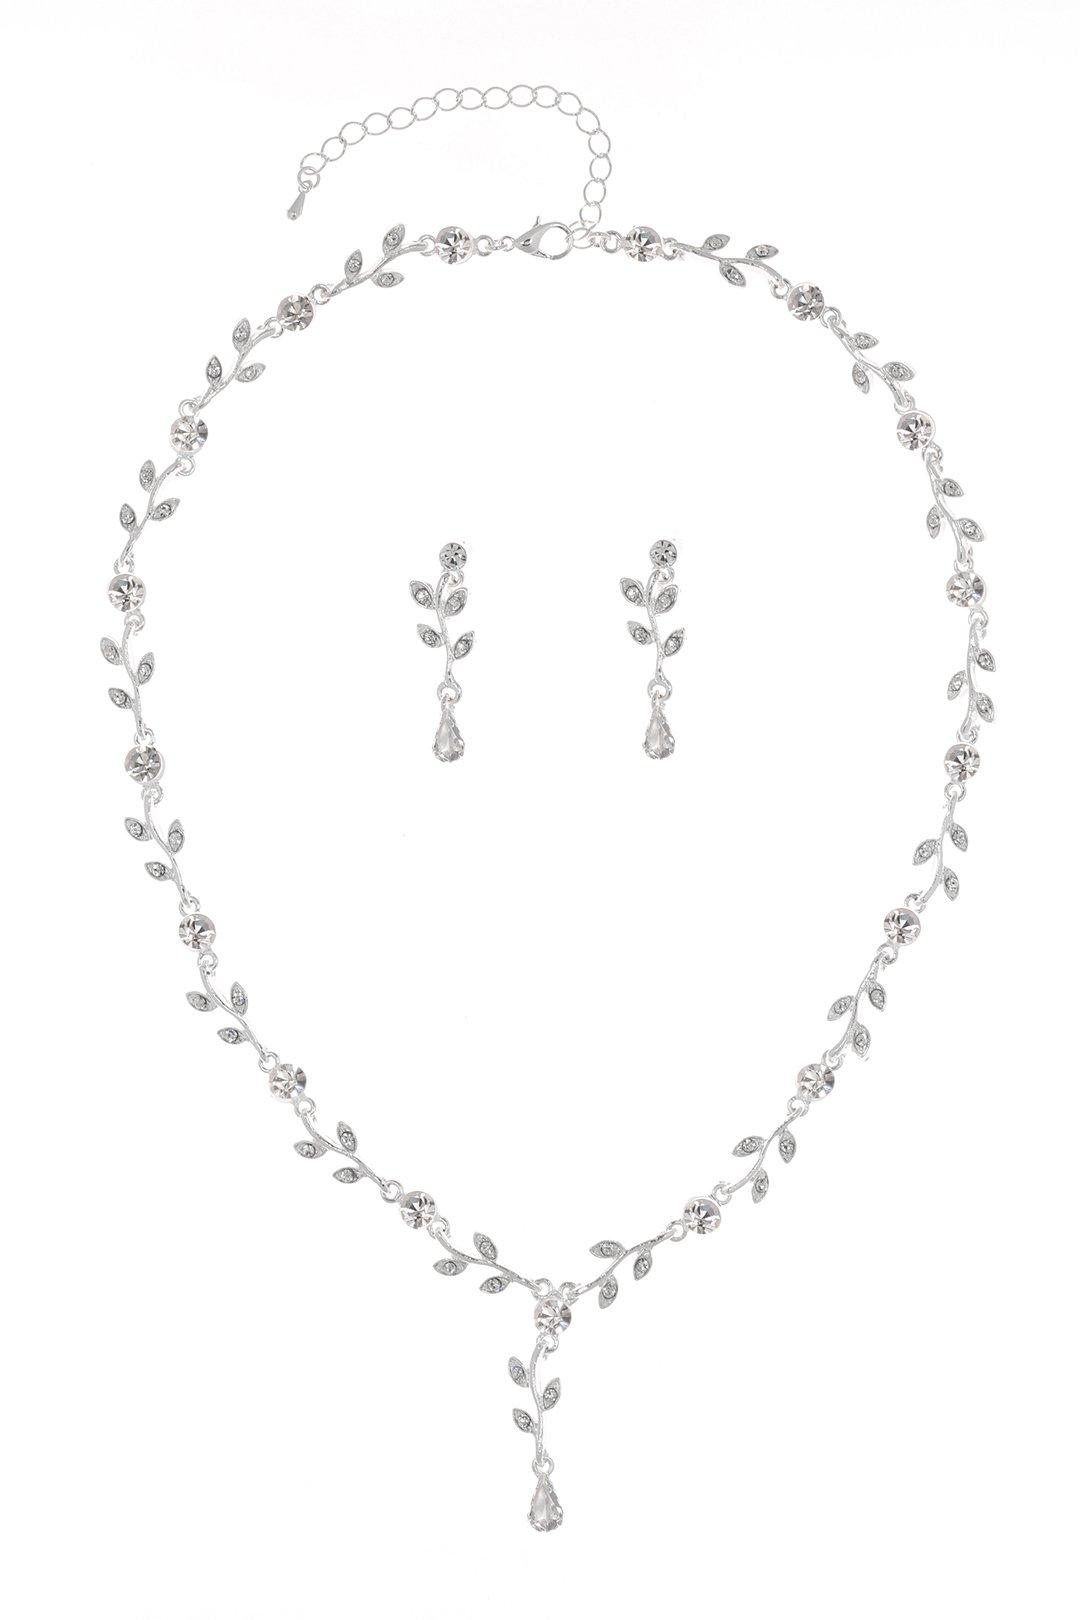 Elegant Vine Design Bridal Wedding Crystal Necklace Earrings Set - Silver Plated Clear Rhinestones N195